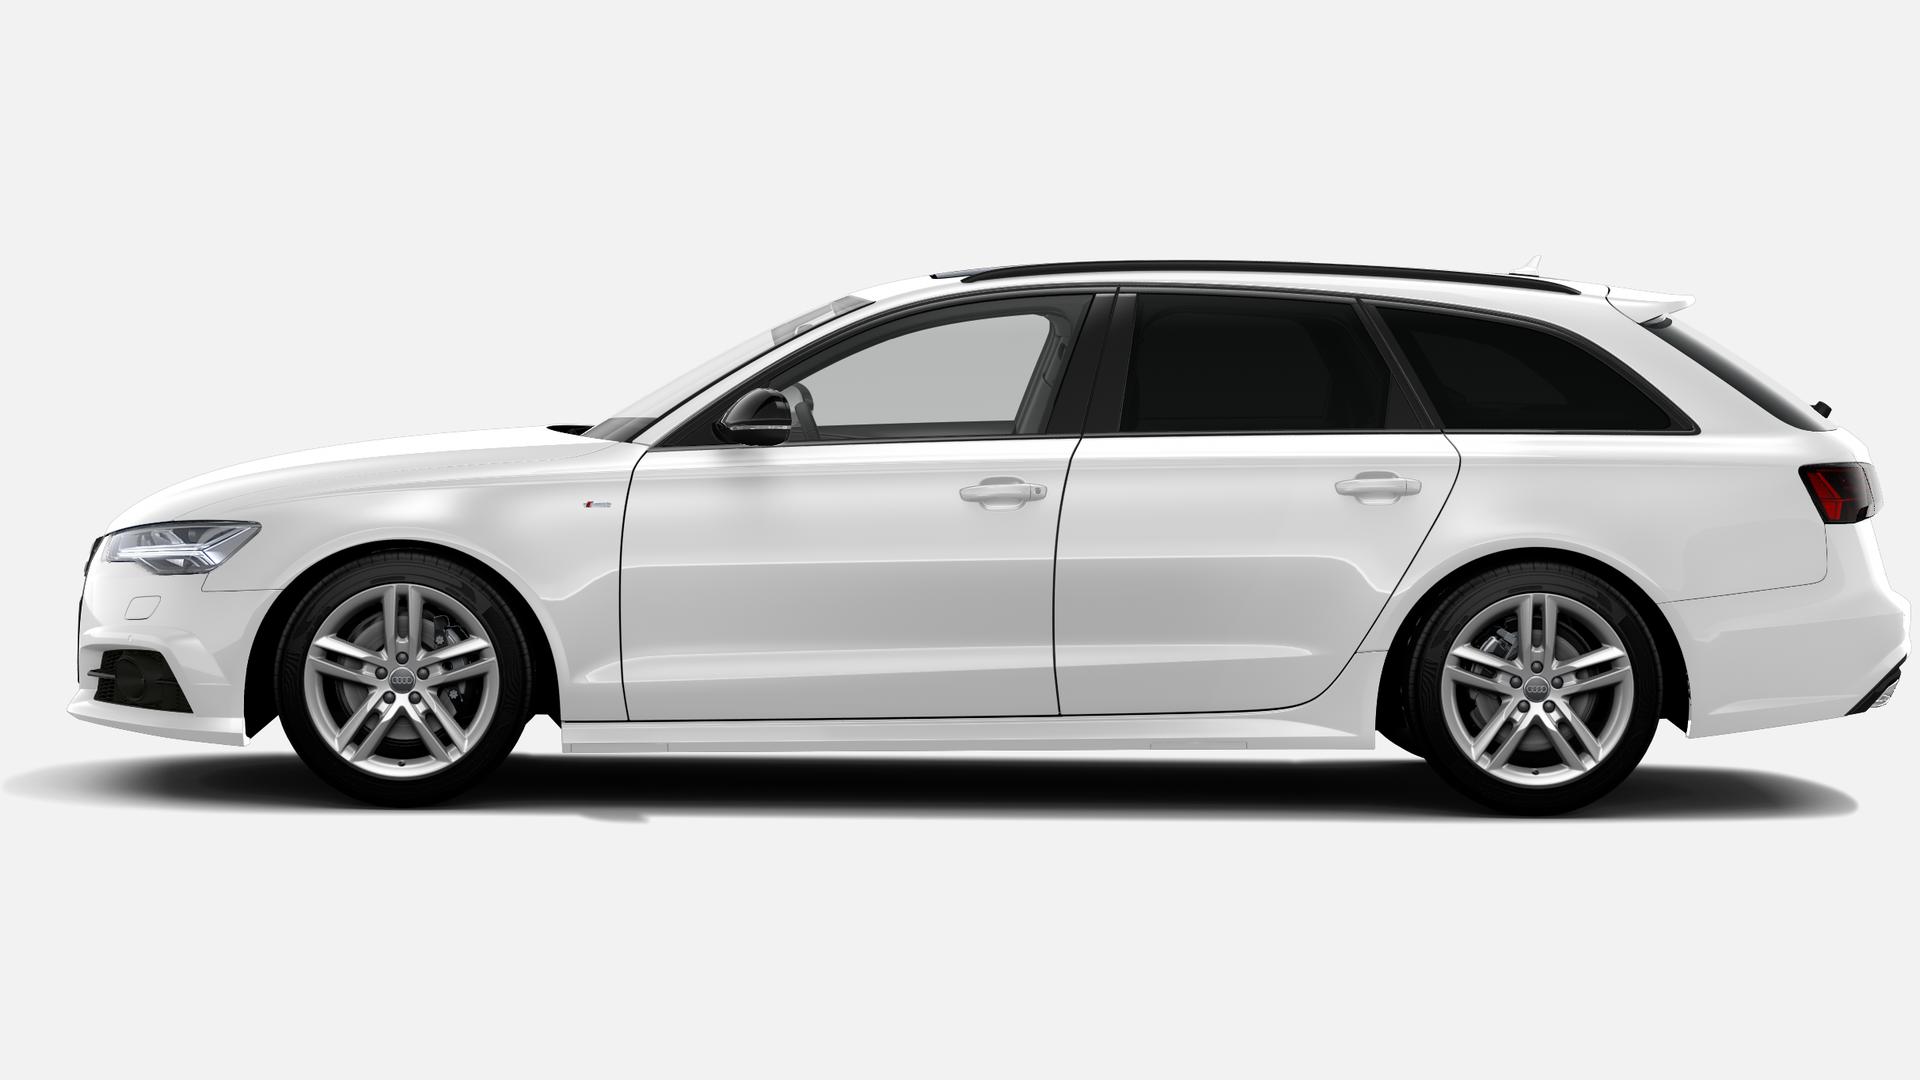 Vista Lateral izquierda de Audi A6 Avant 2.0 TDI Black line ultra S Tronic 140 kW (190 CV)